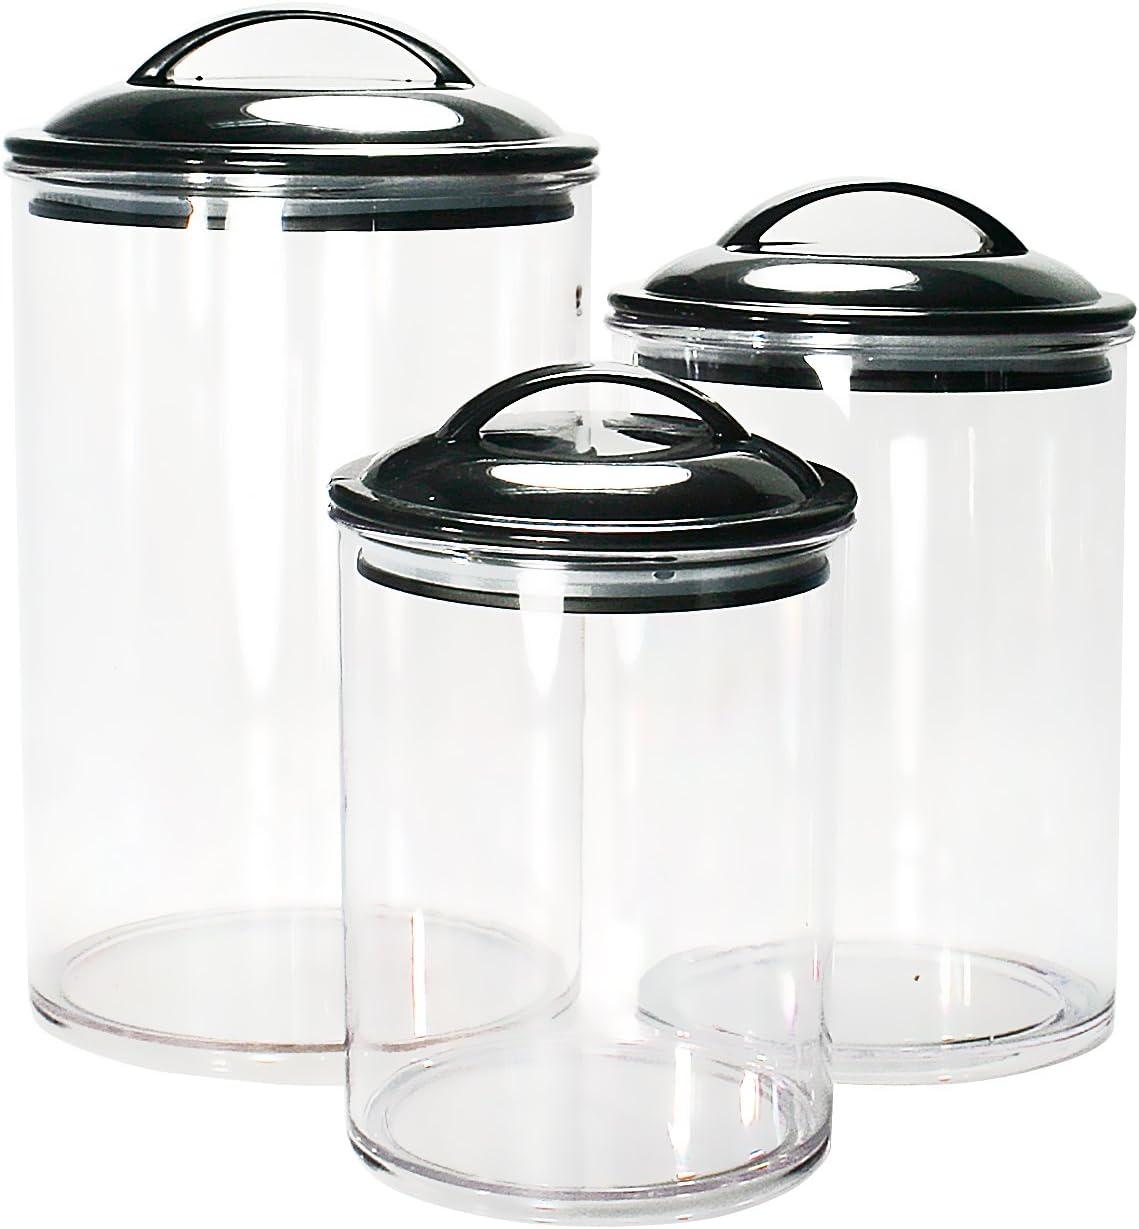 Calypso Basics by Reston Lloyd Acrylic Storage Canisters, Set of 3, Black